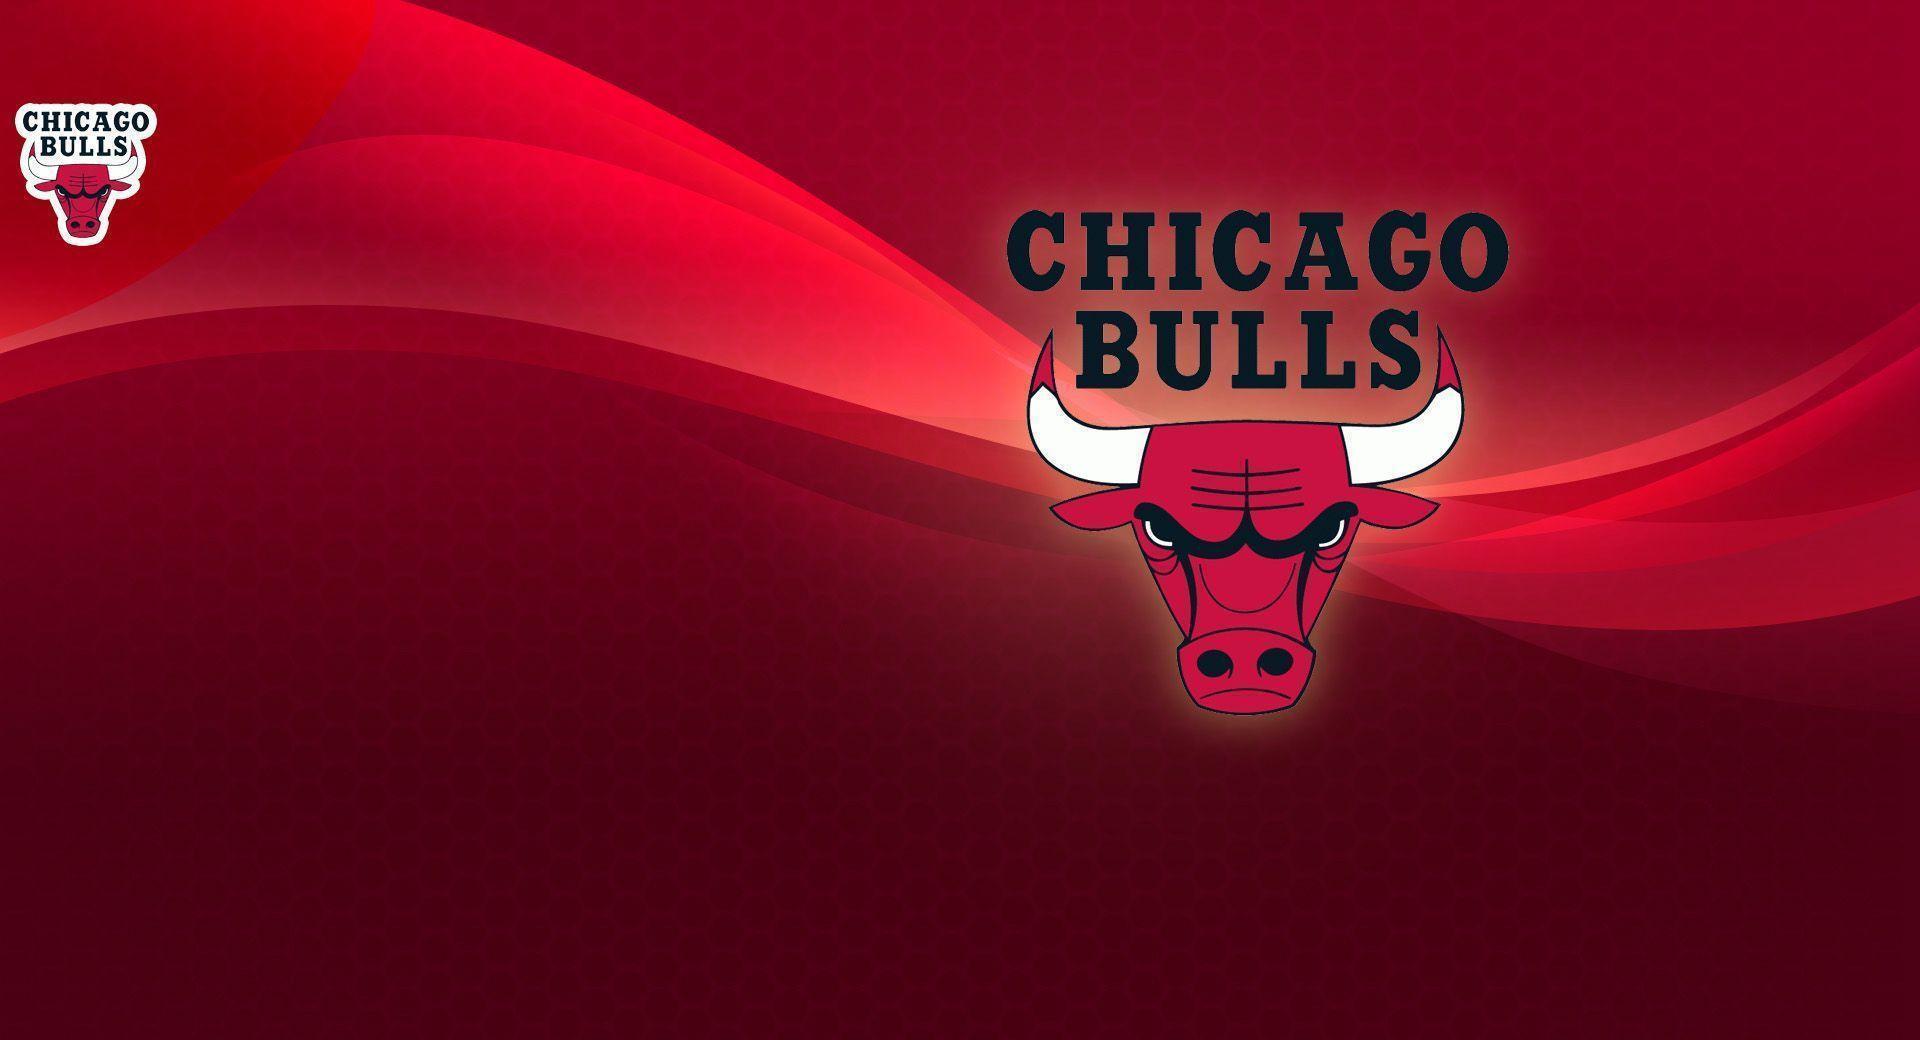 Chicago Bulls Wallpapers HD 2015 1920x1040